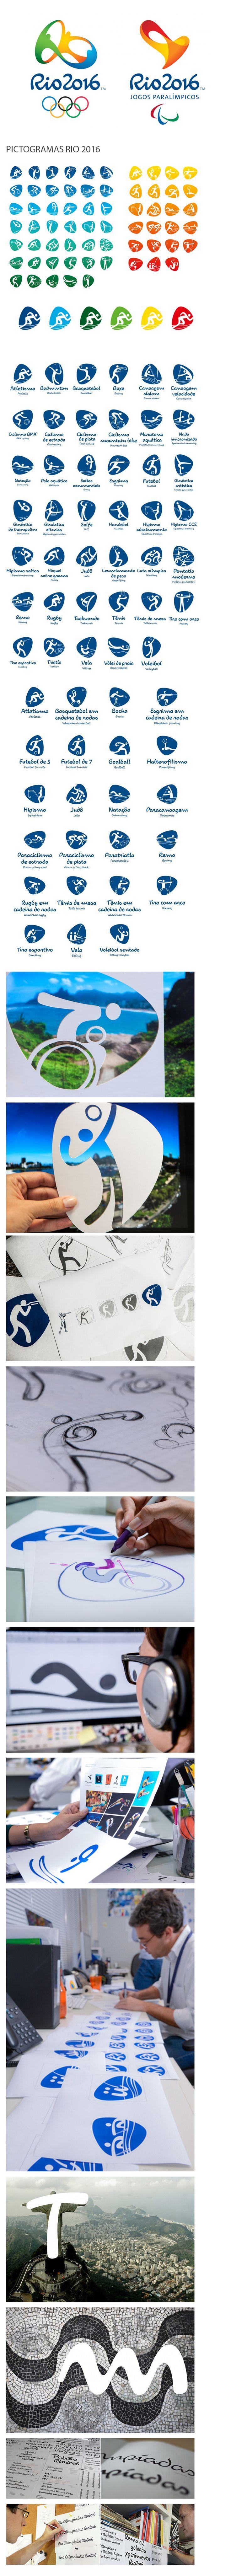 More of the amazing Rio 2016 branding.